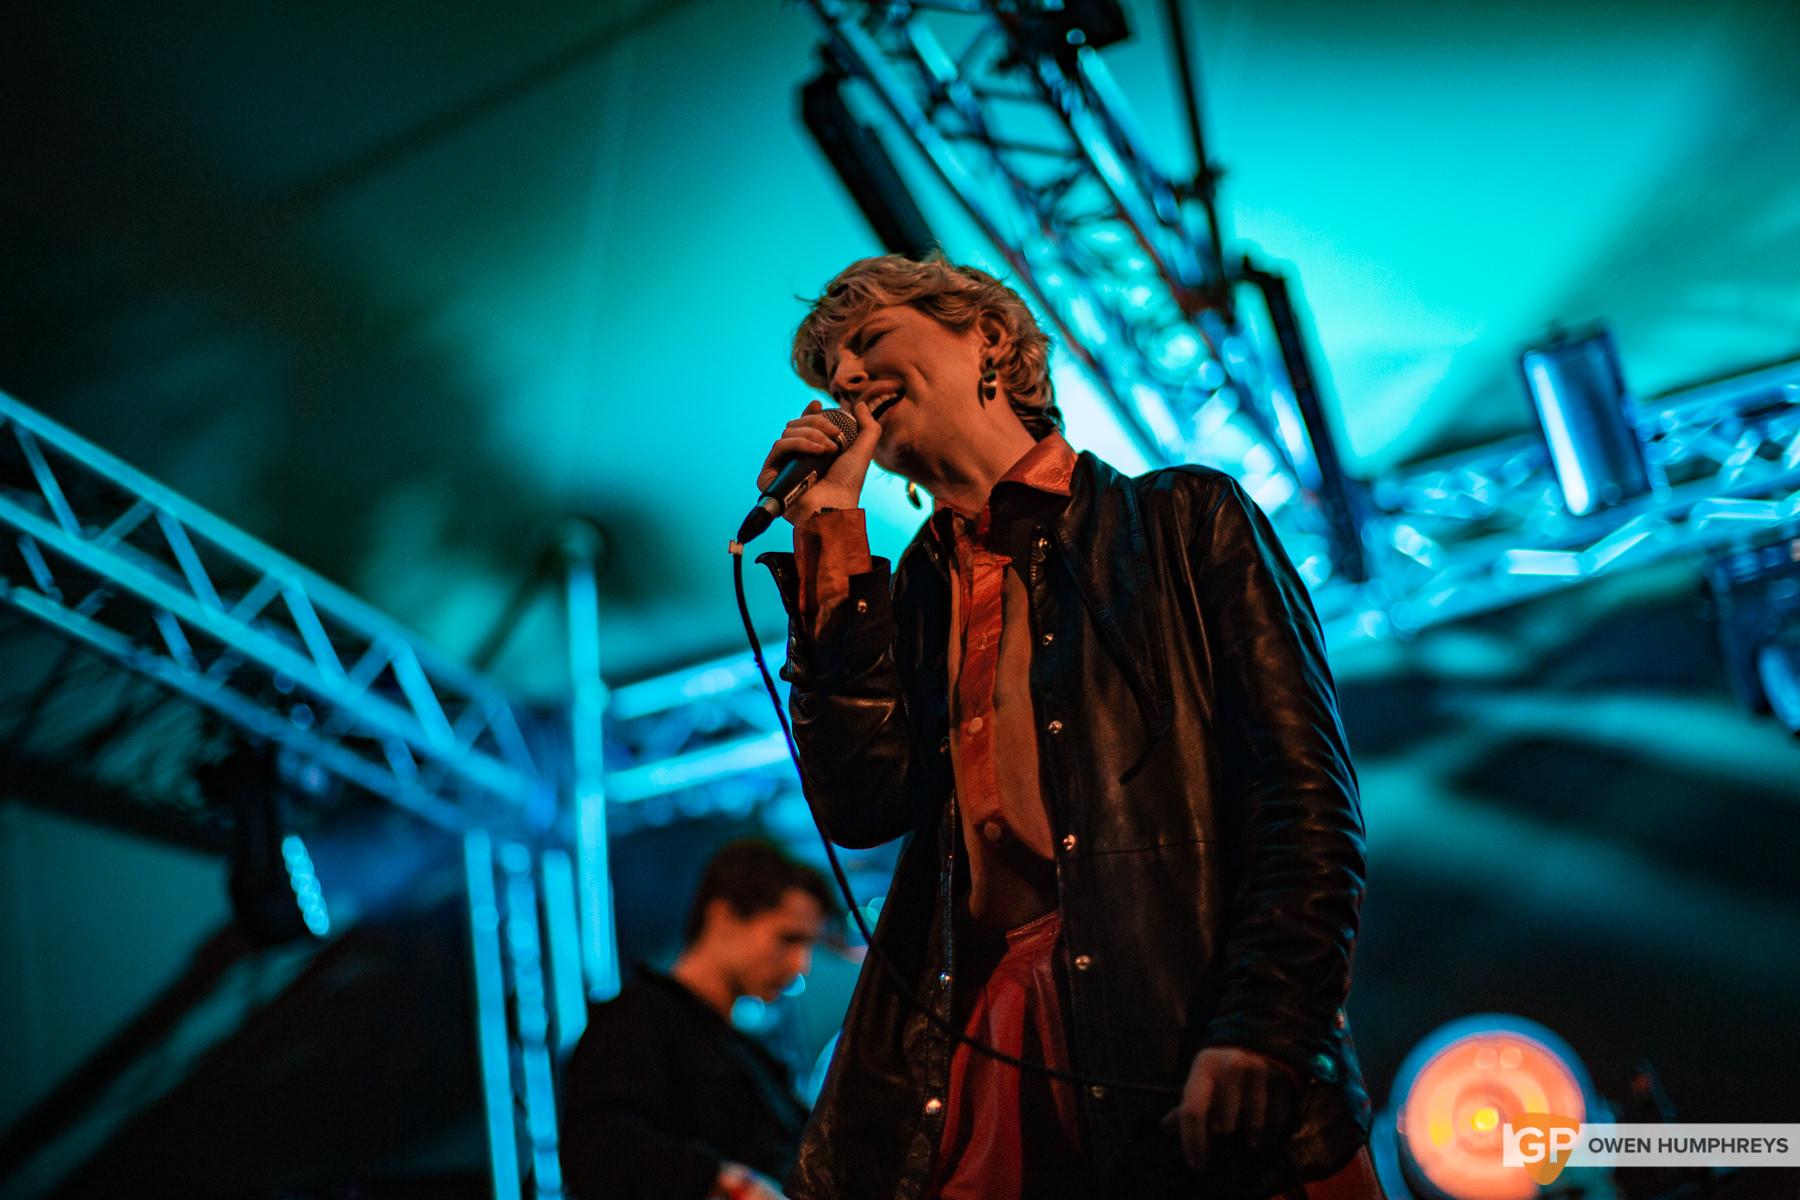 Soda Blonde at Knockanstockan 2019. Photo by Owen Humphreys. www.owen.ie